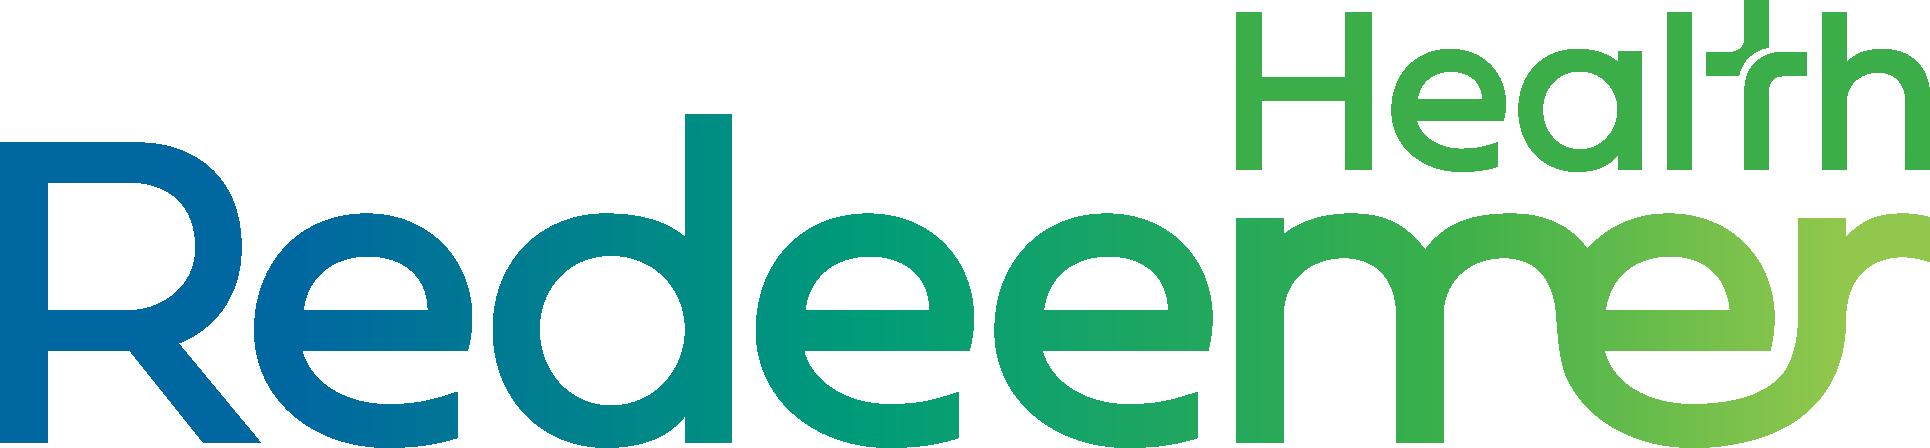 Redeemer Health Careers Logo